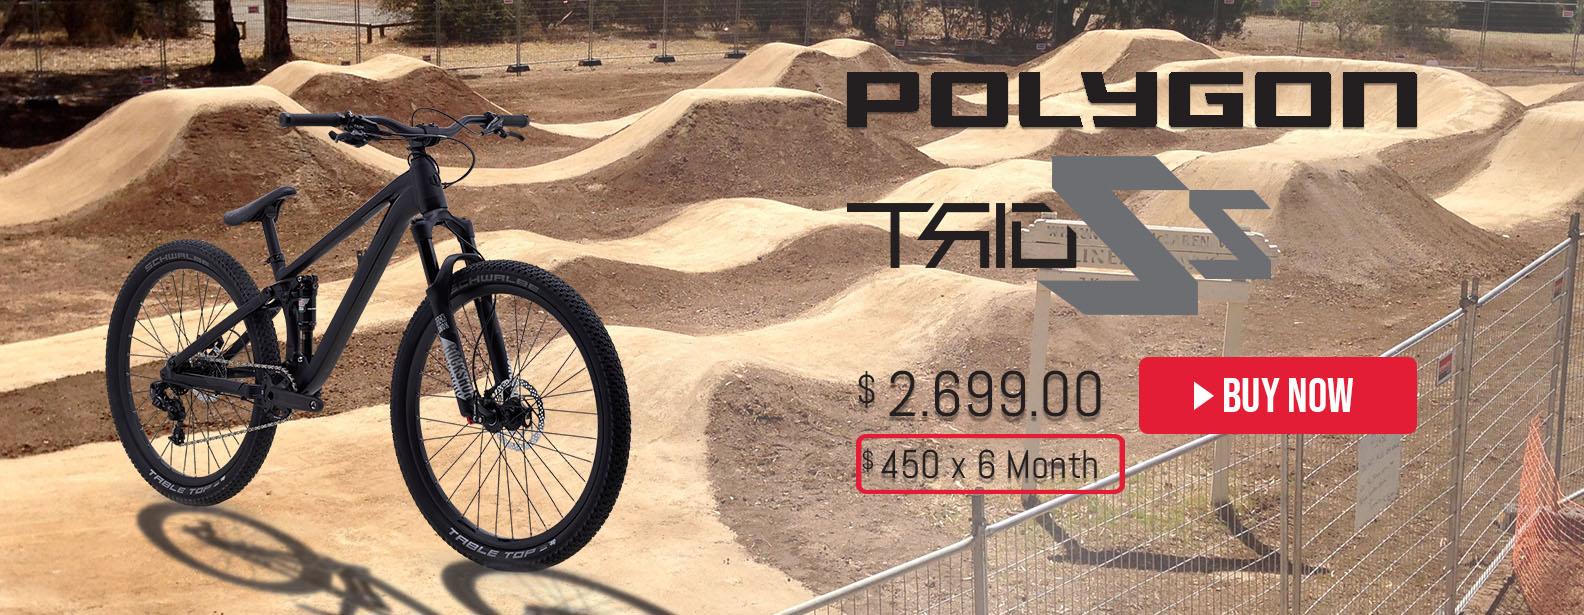 Polygon Trid ZZ Dirt Jump Bike